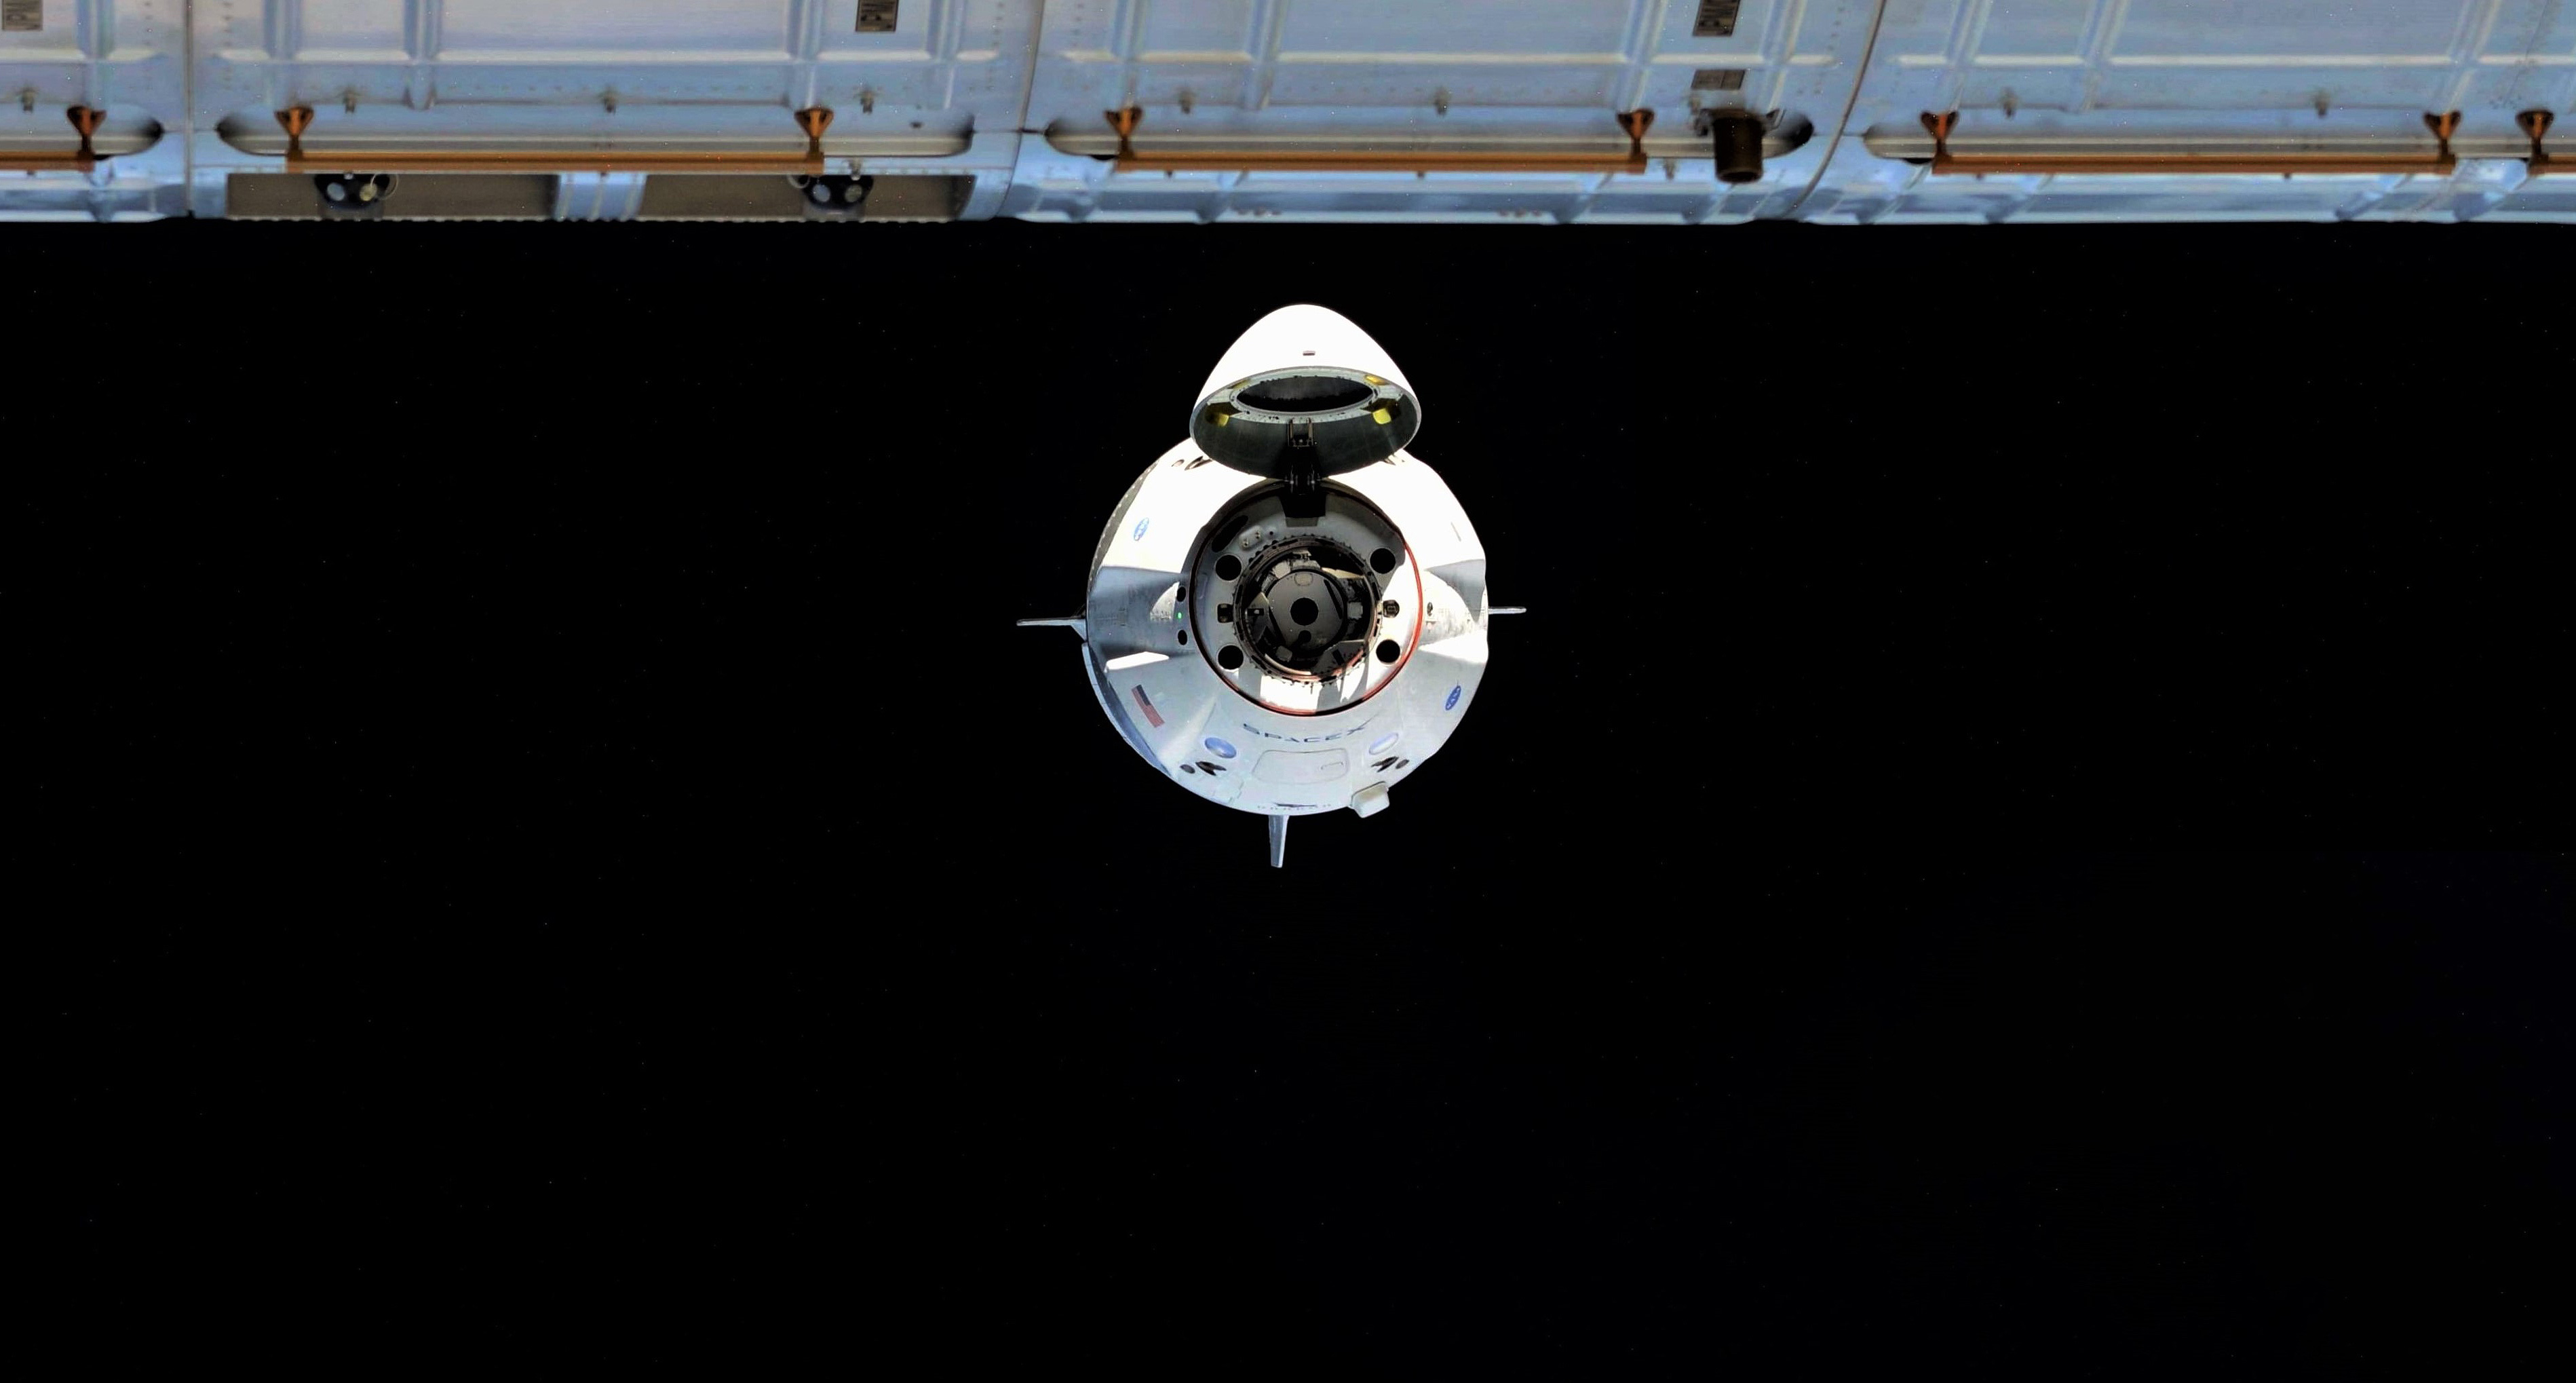 Crew Dragon DM-1 ISS arrival 030319 (Oleg Kononenko) 1 crop 3 edit